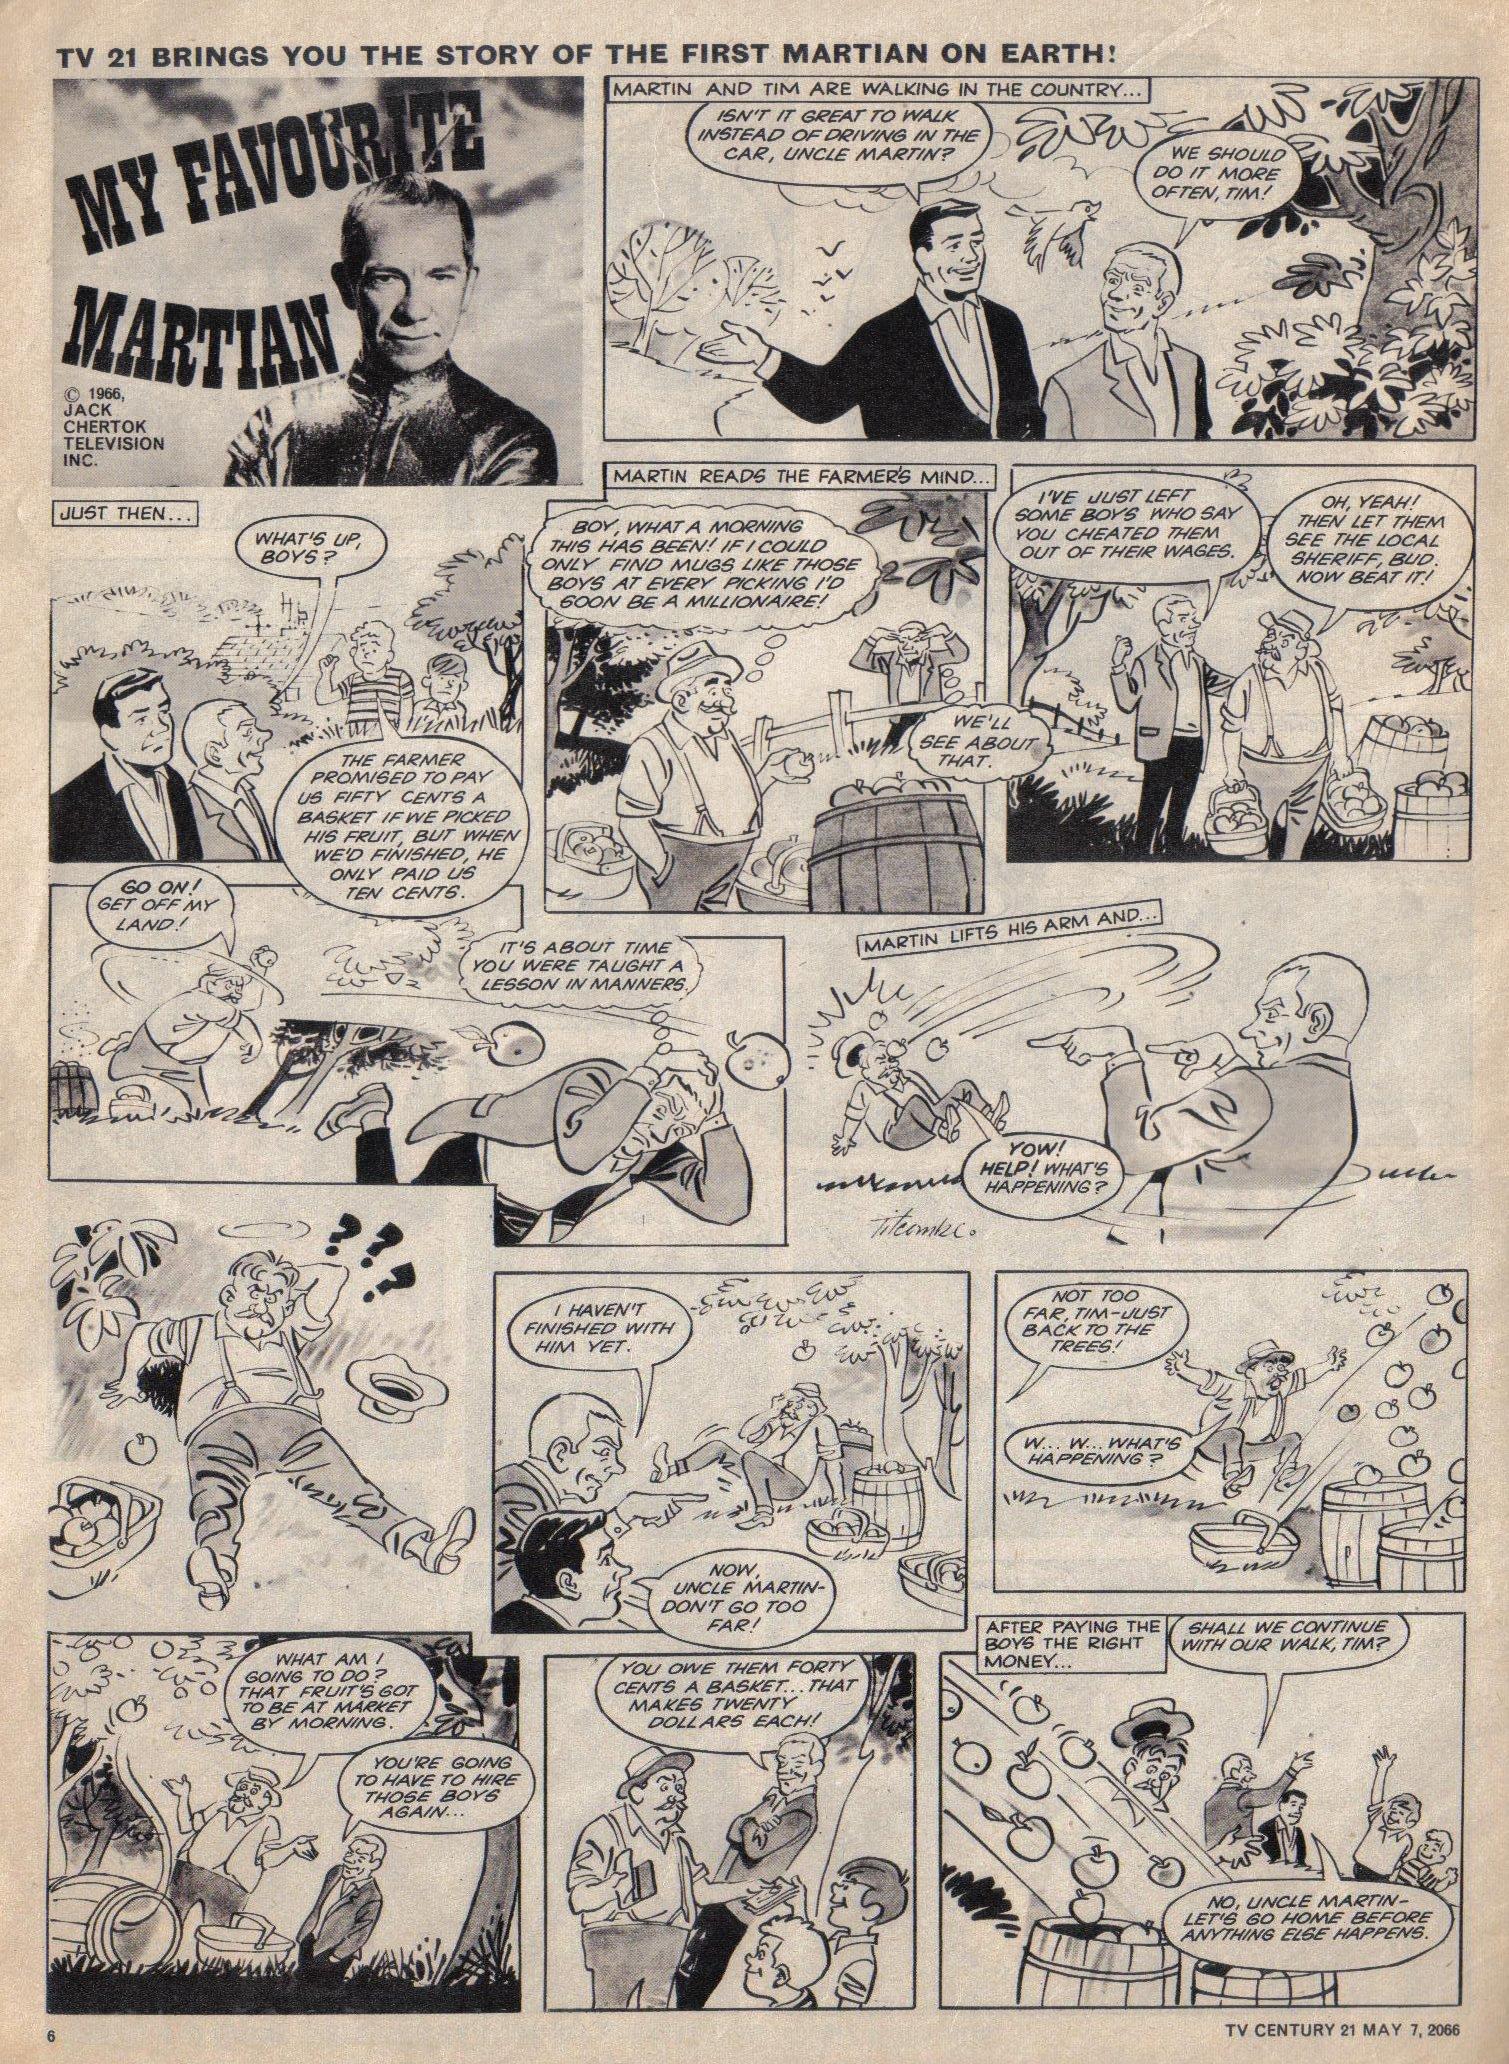 Read online TV Century 21 (TV 21) comic -  Issue #68 - 6